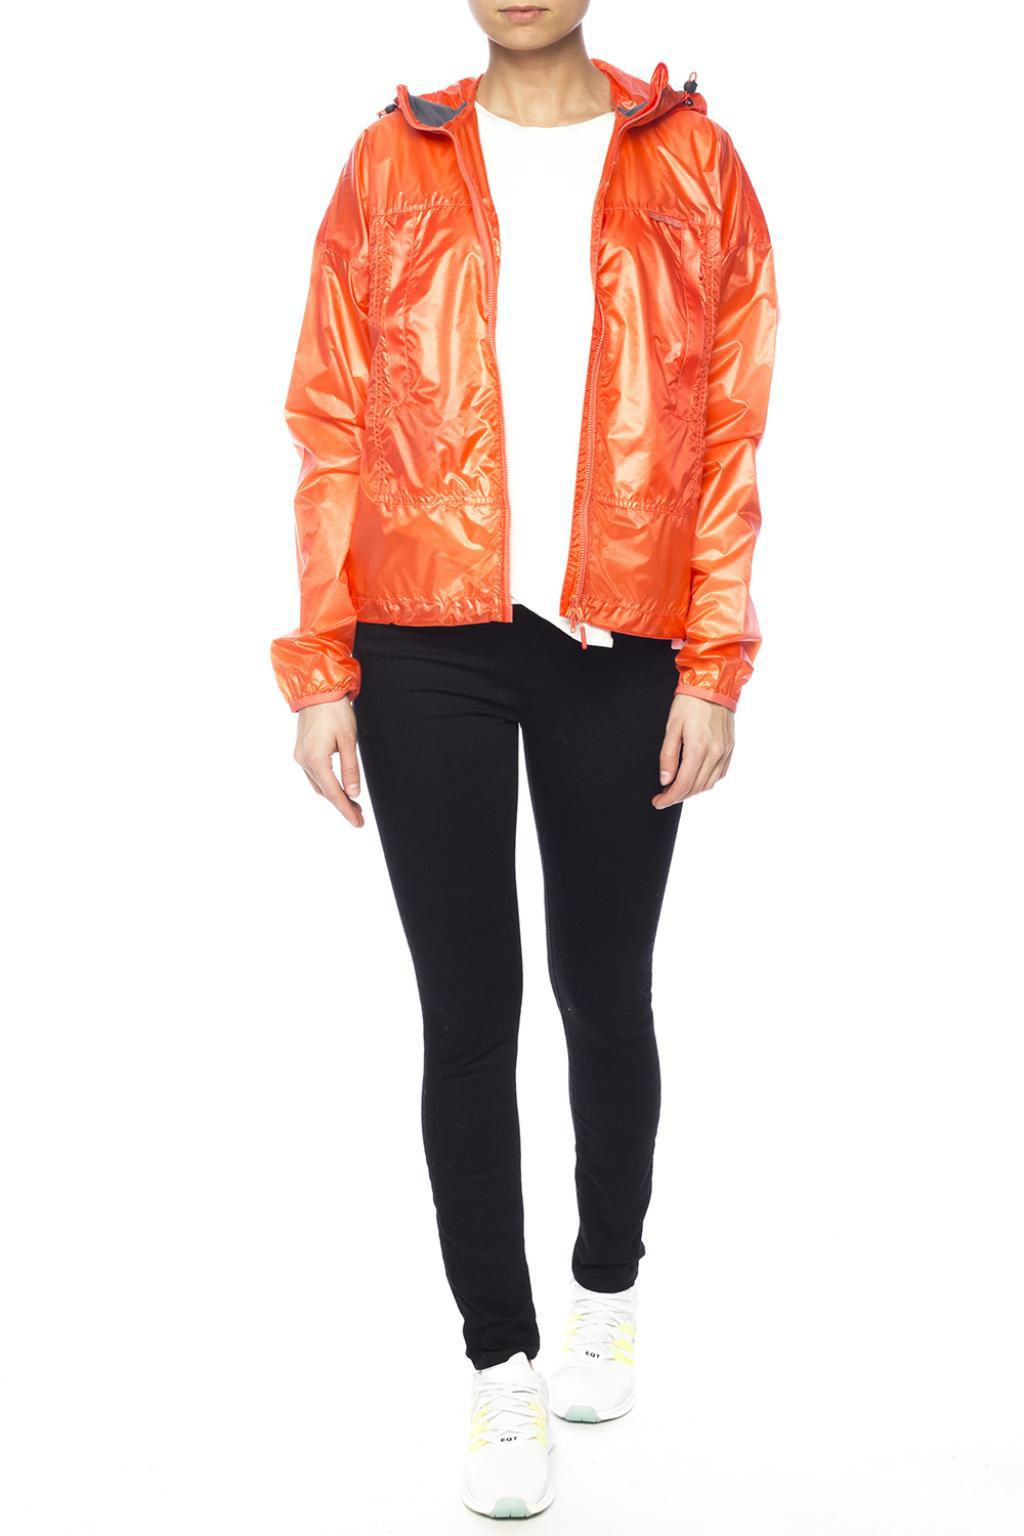 Canada Goose - Orange Hooded Rain Jacket - Lyst. View fullscreen